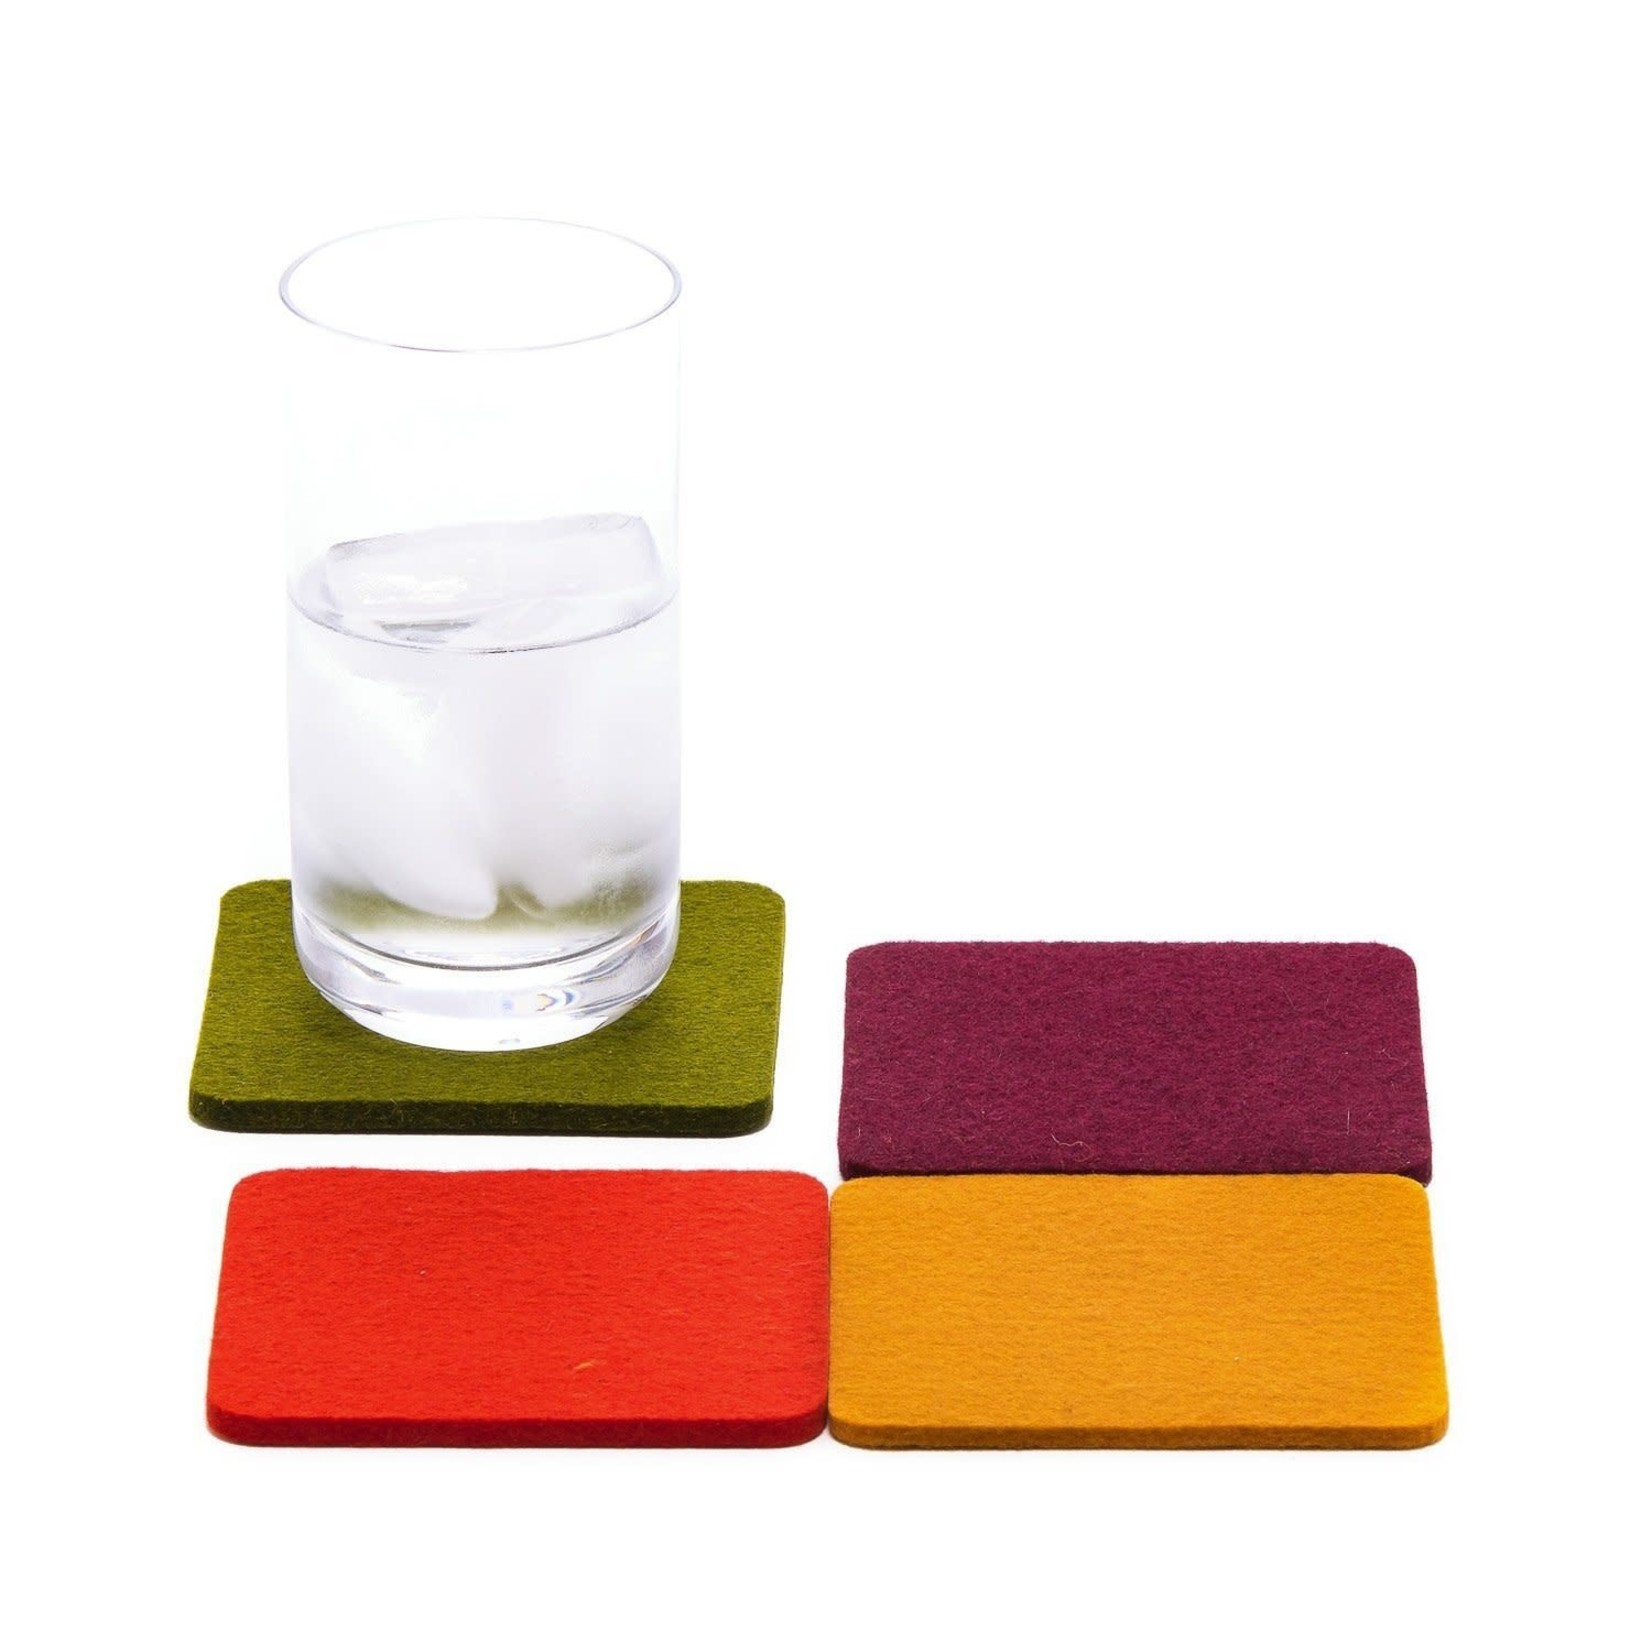 Graf & Lantz Graf & Lantz Coaster square 4 pack Spice